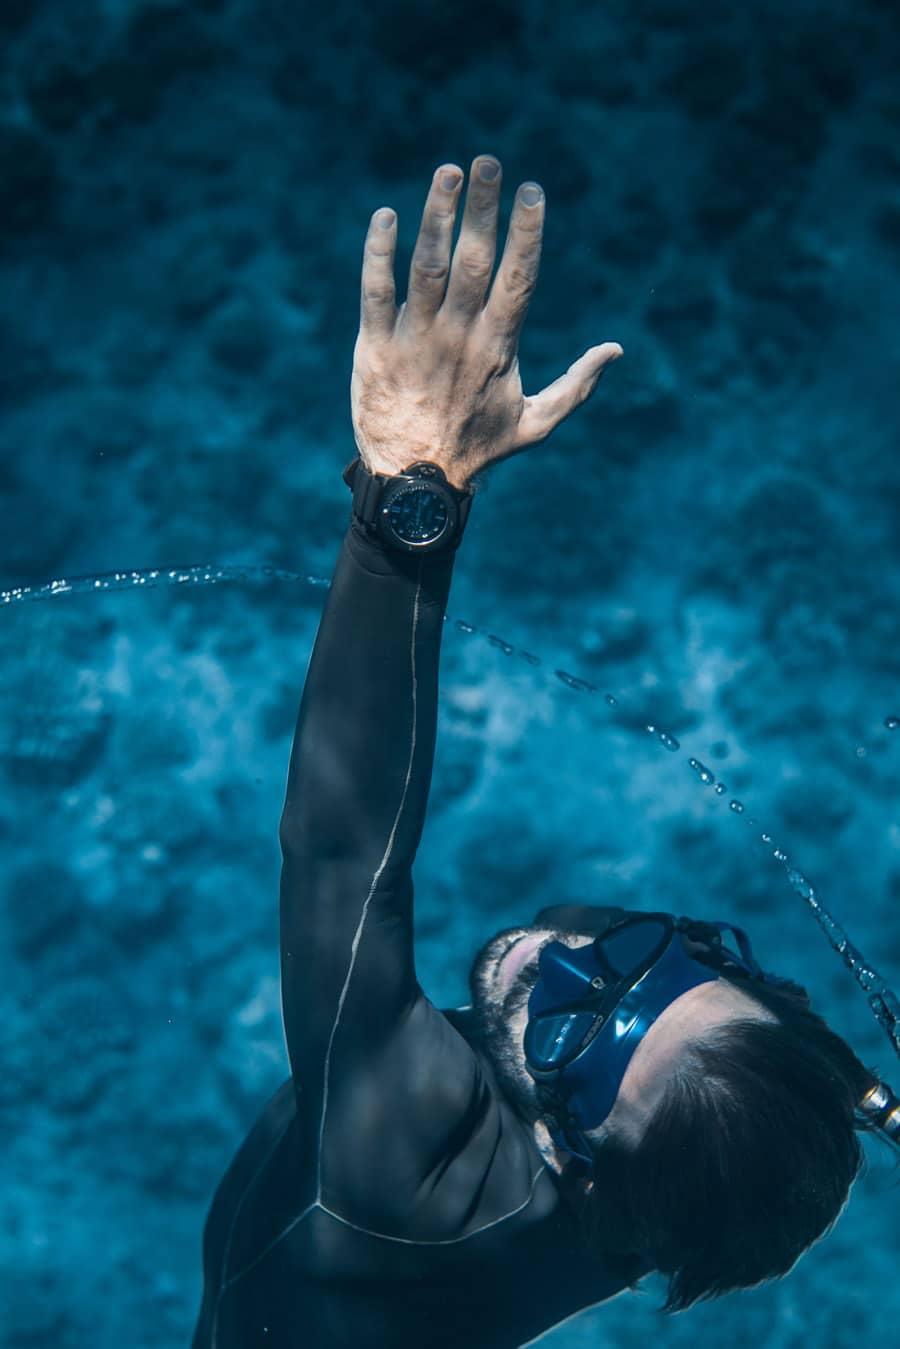 Taucheruhrenspecial 2021: Panerai Submersible Blu Notte Taucher